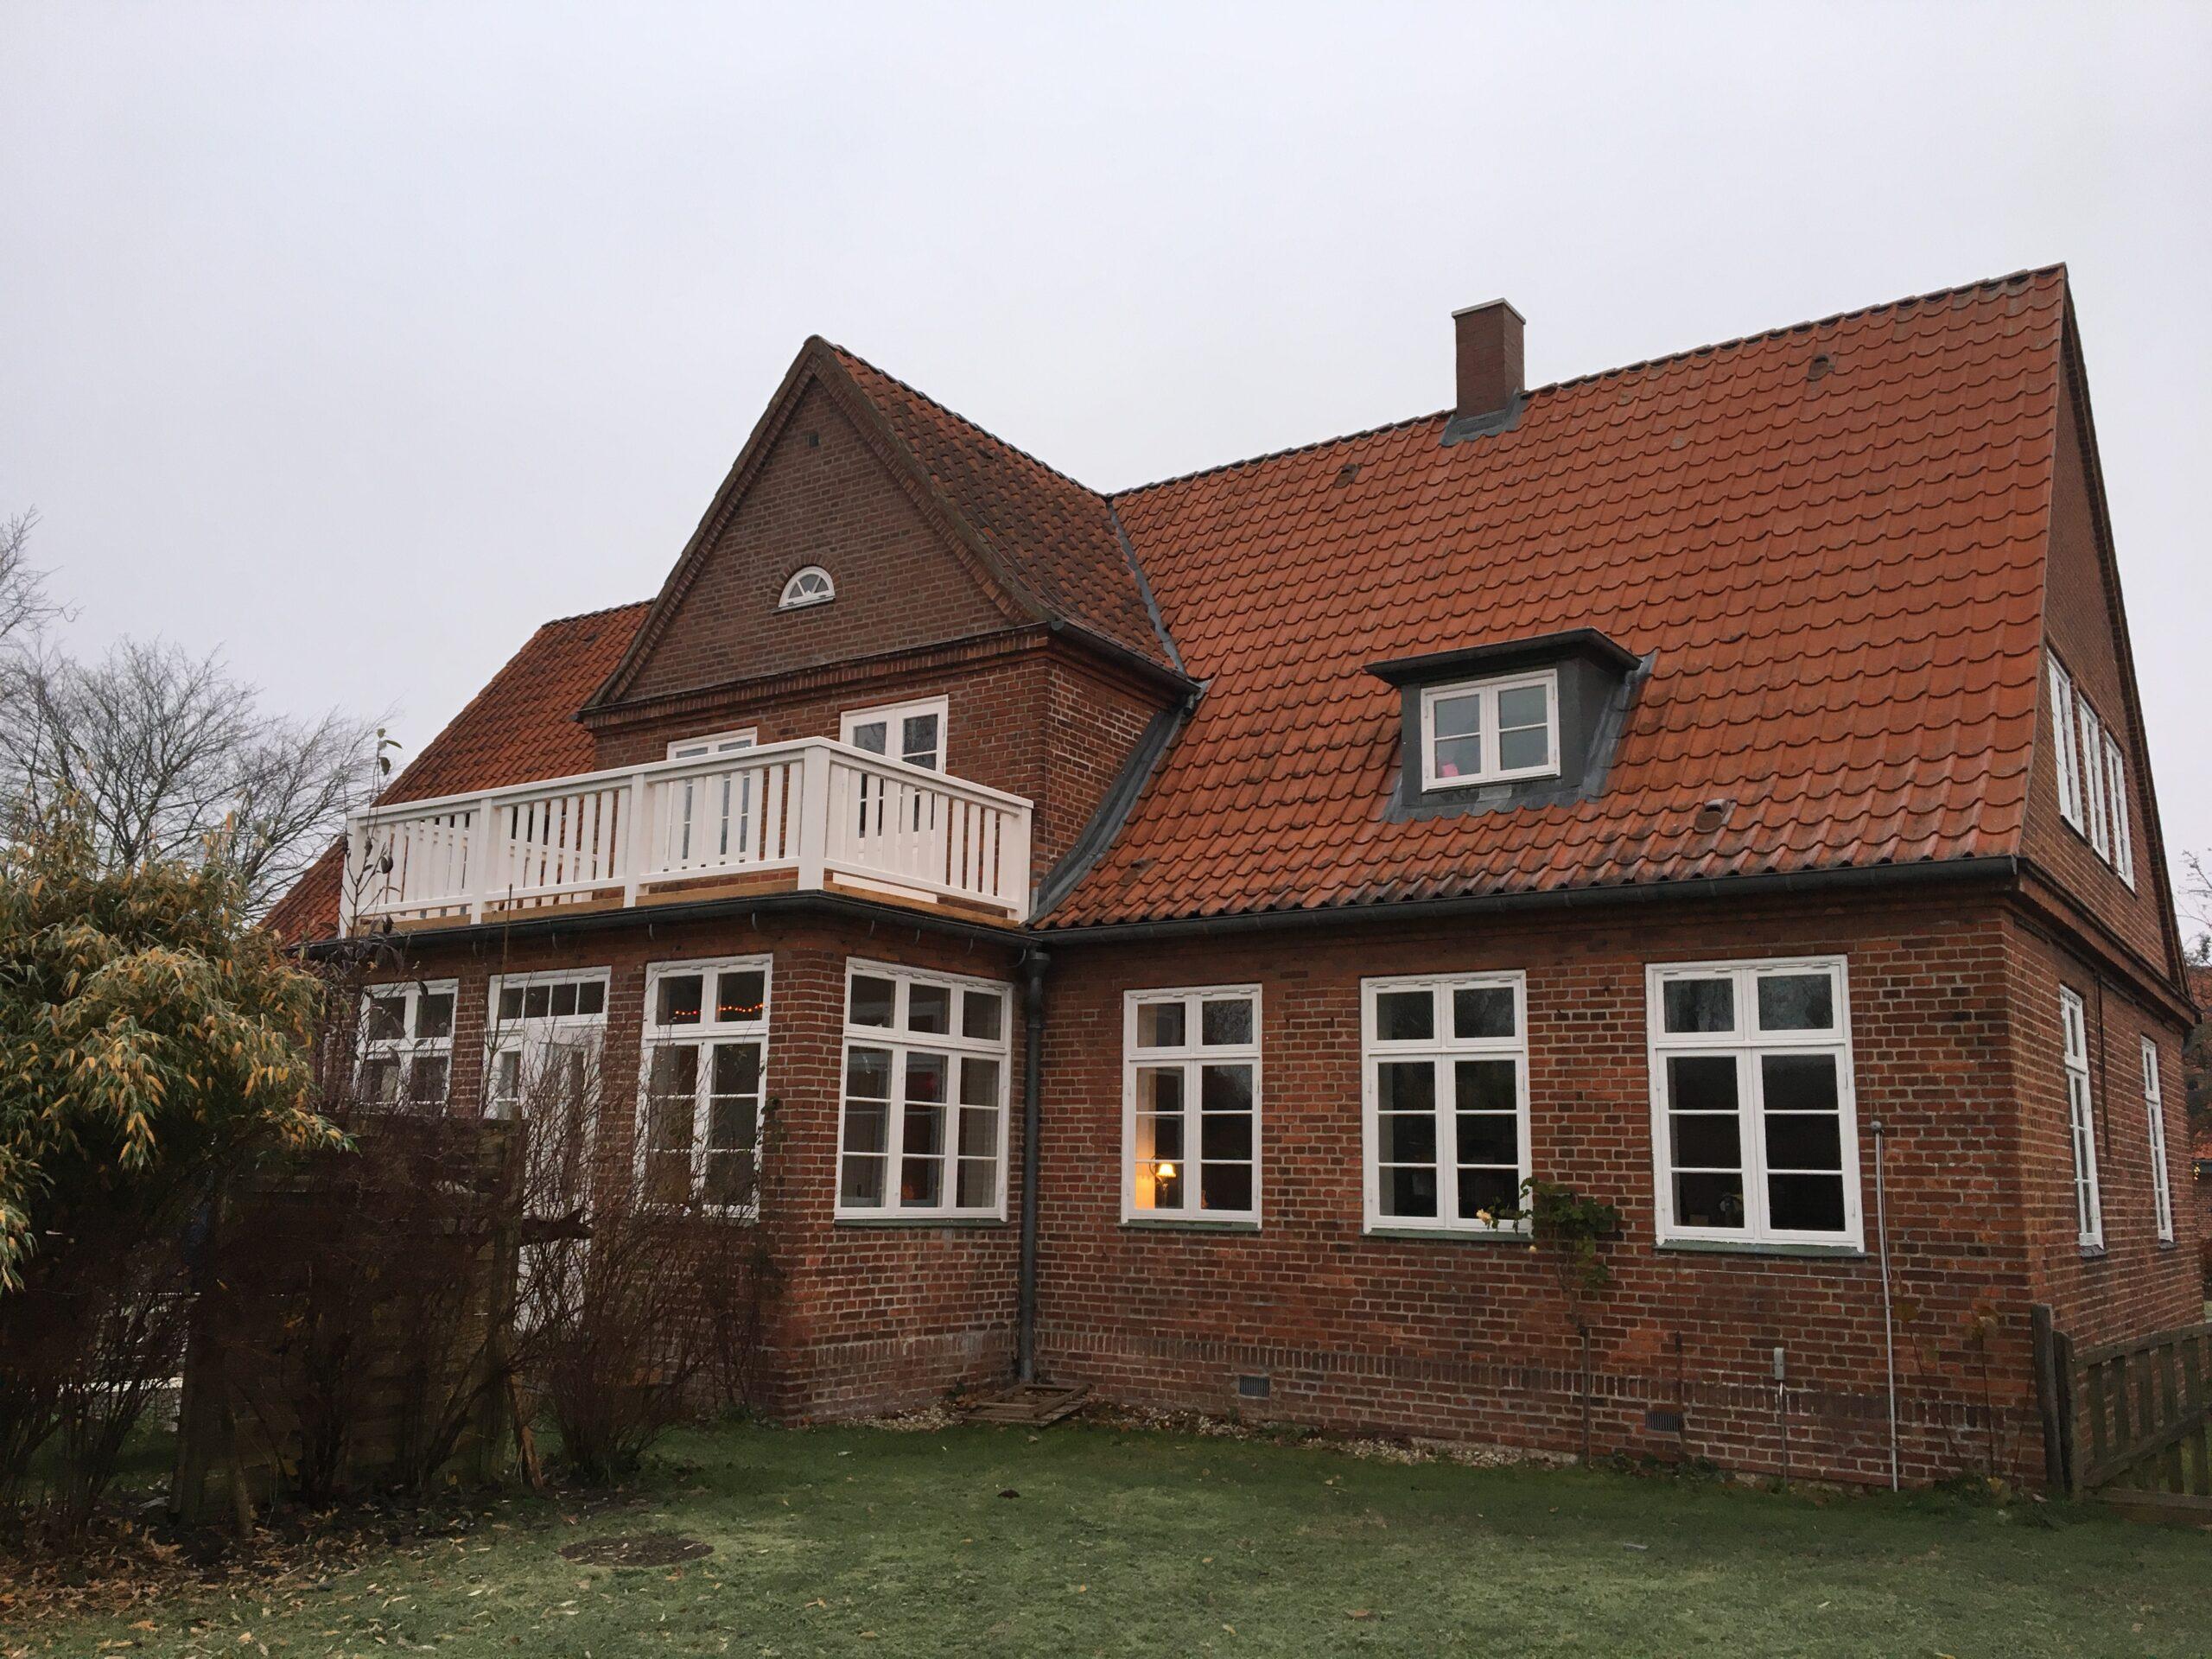 Den tyske præstegård, Løgumkloster